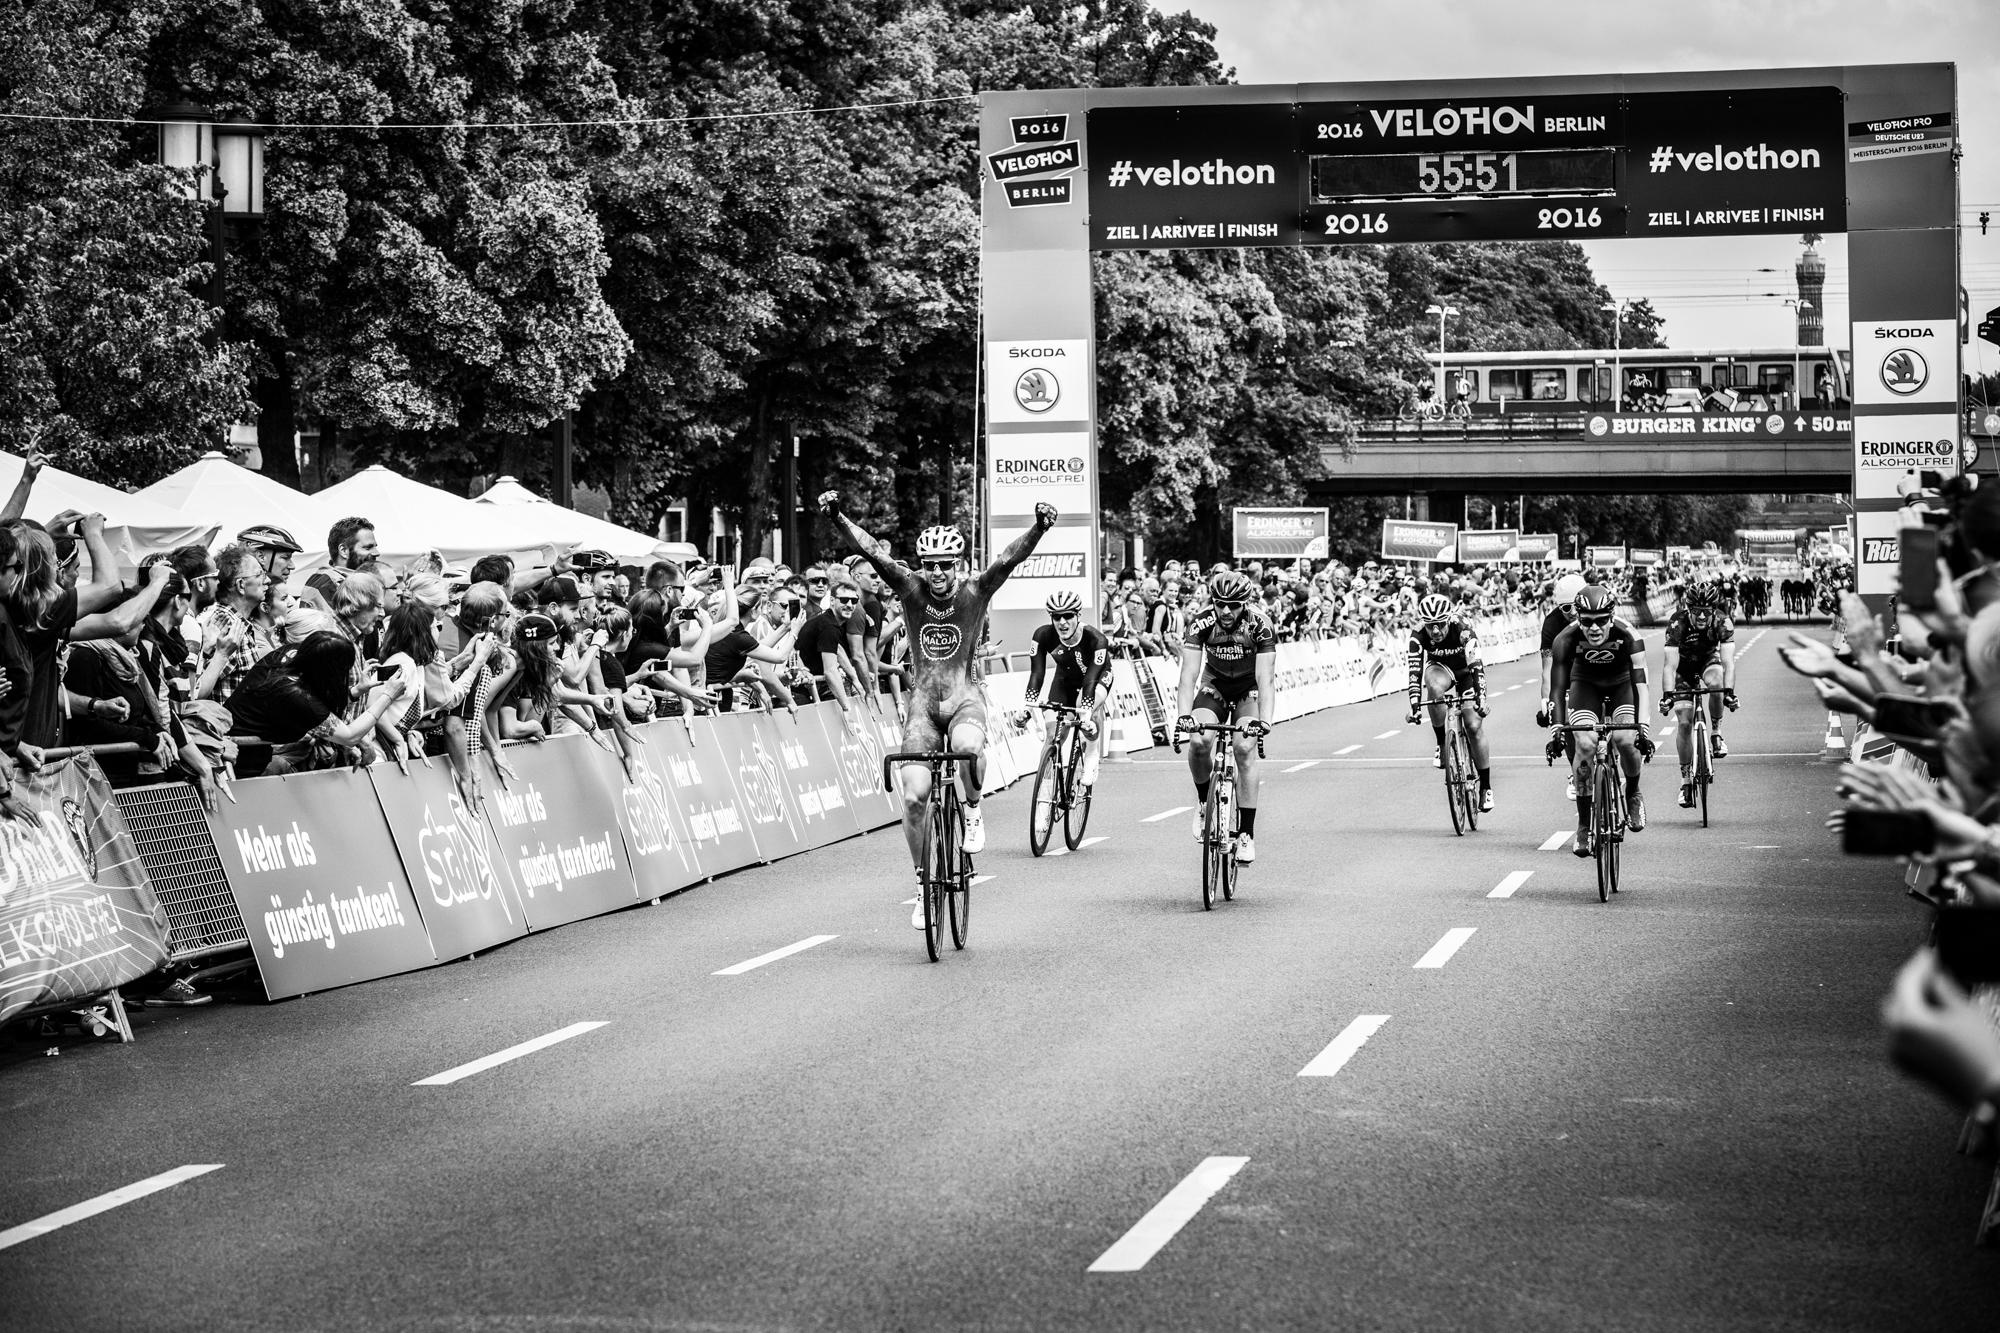 RAD RACE FIXED42 World Championships, Berlin 2016. Pic by Adrian Vesenbeckh